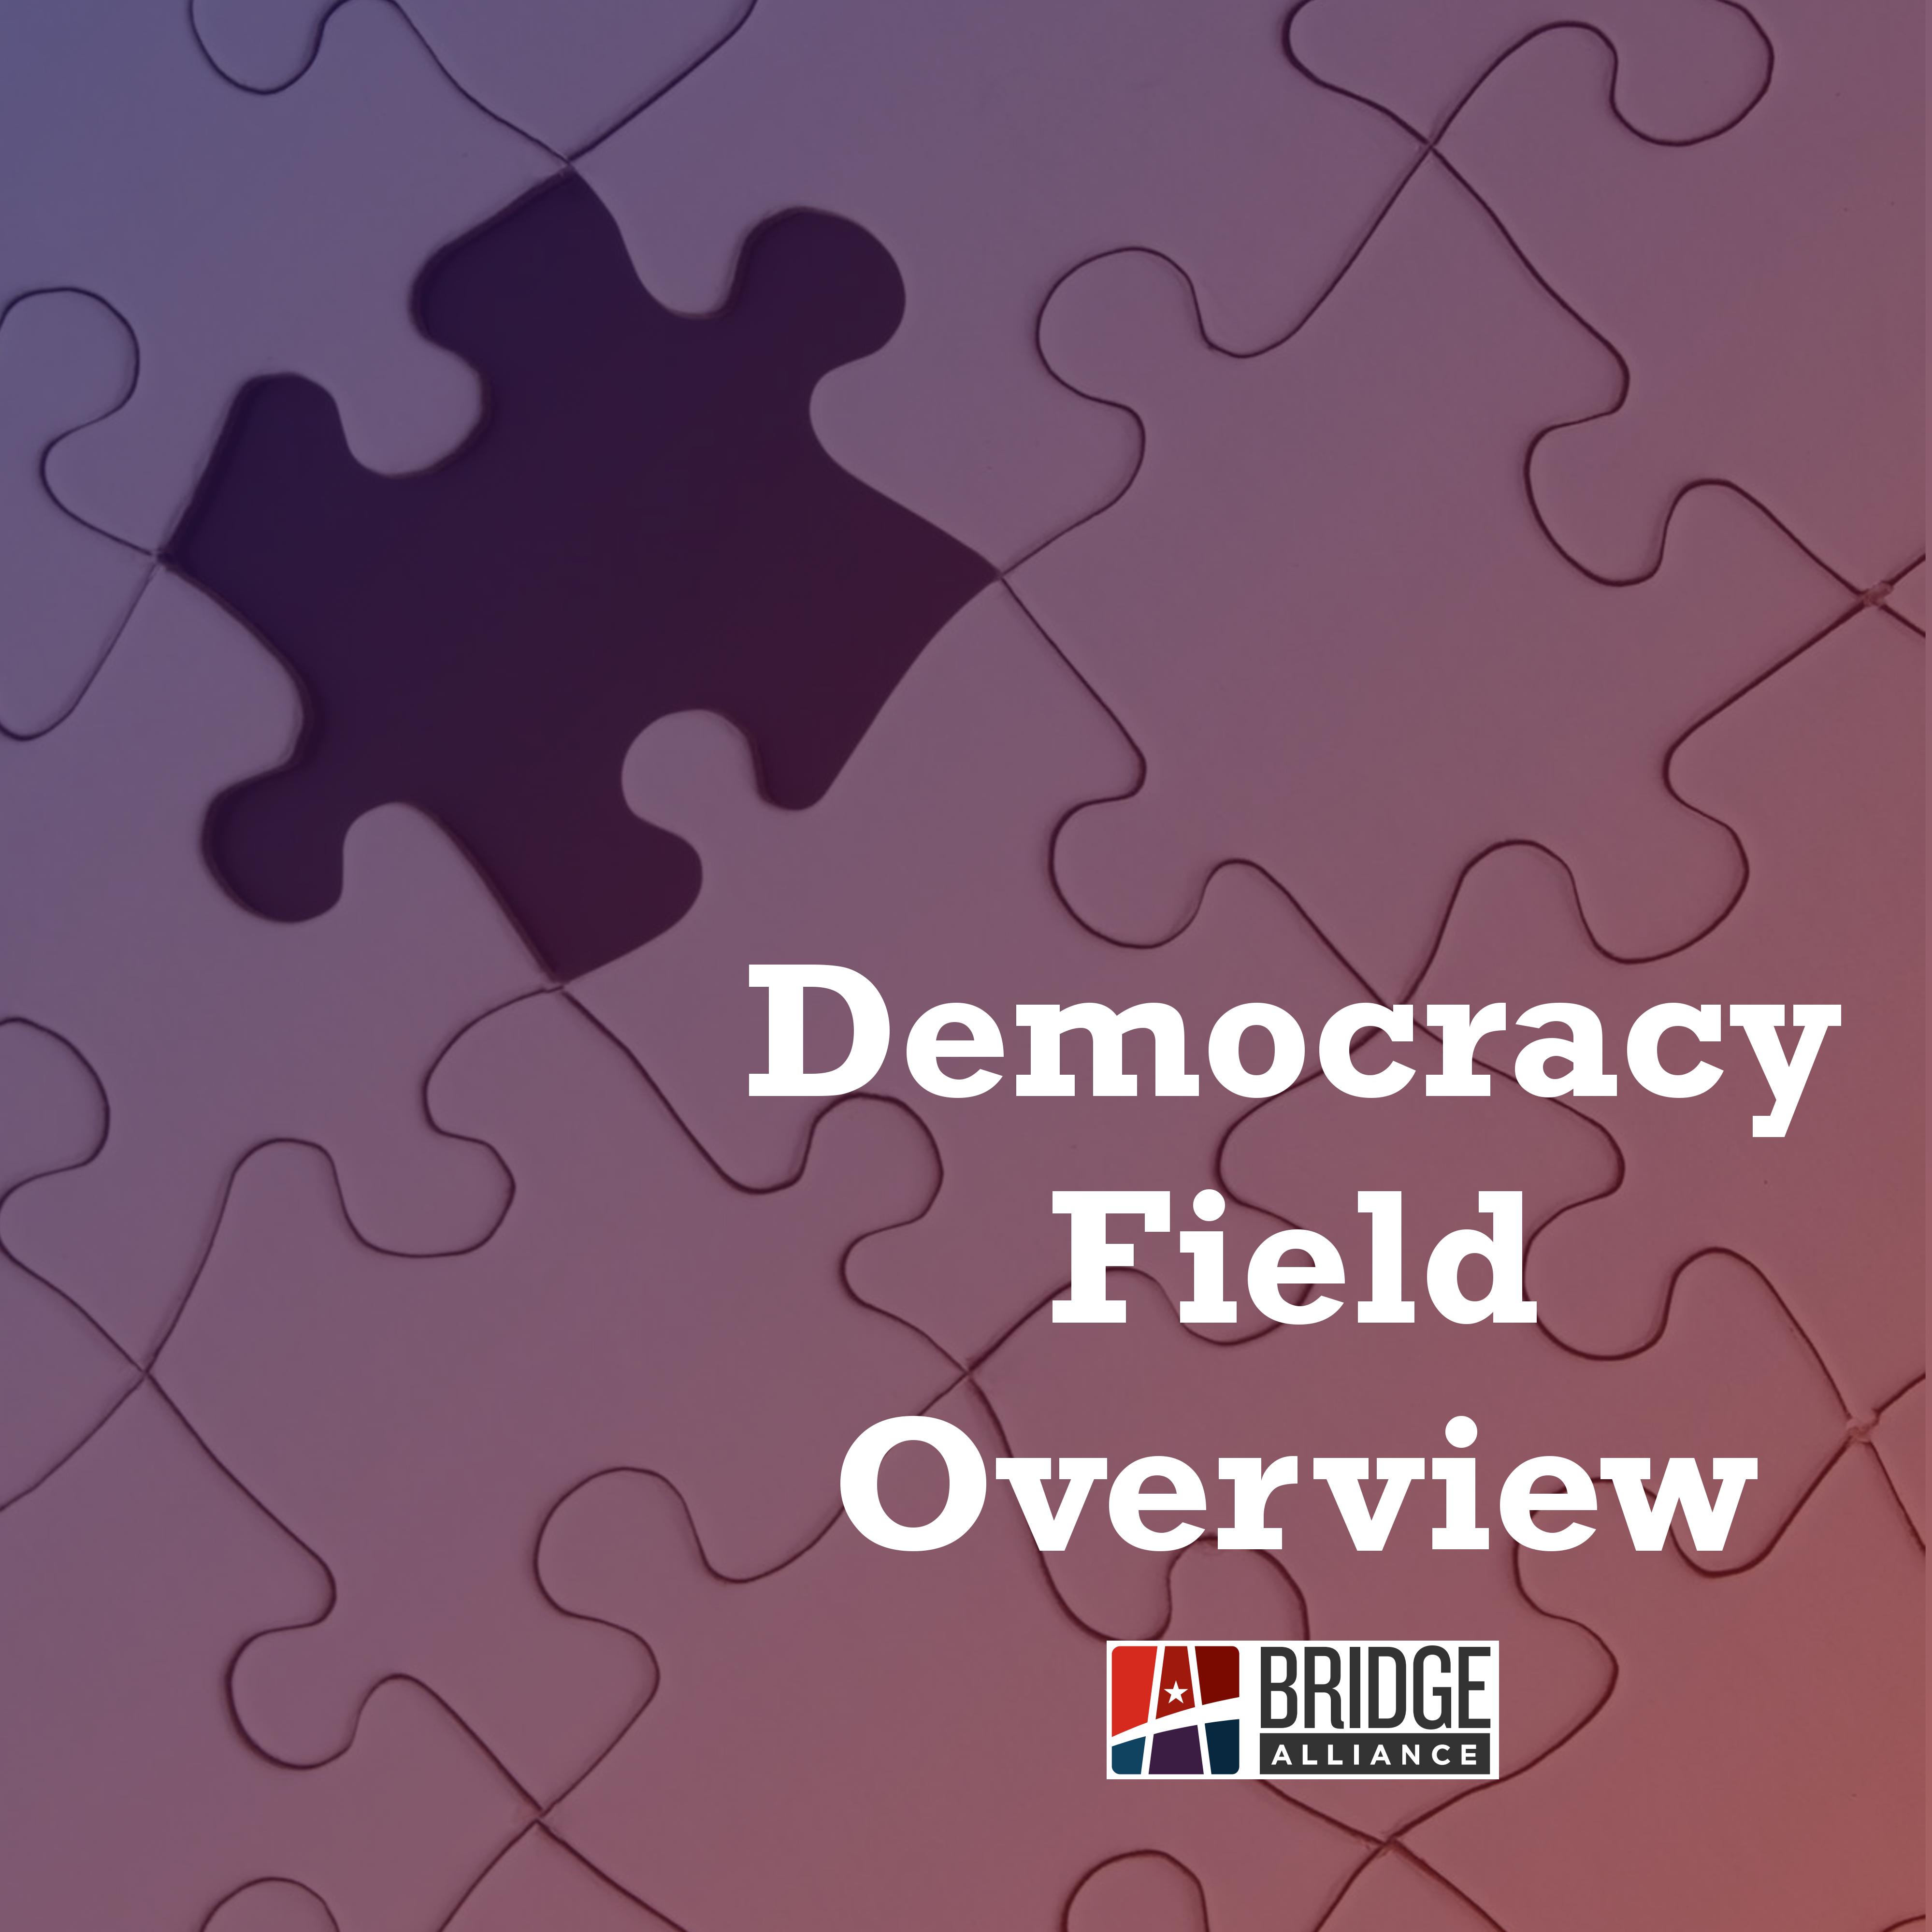 DemocracyOverviewGraphic.jpg